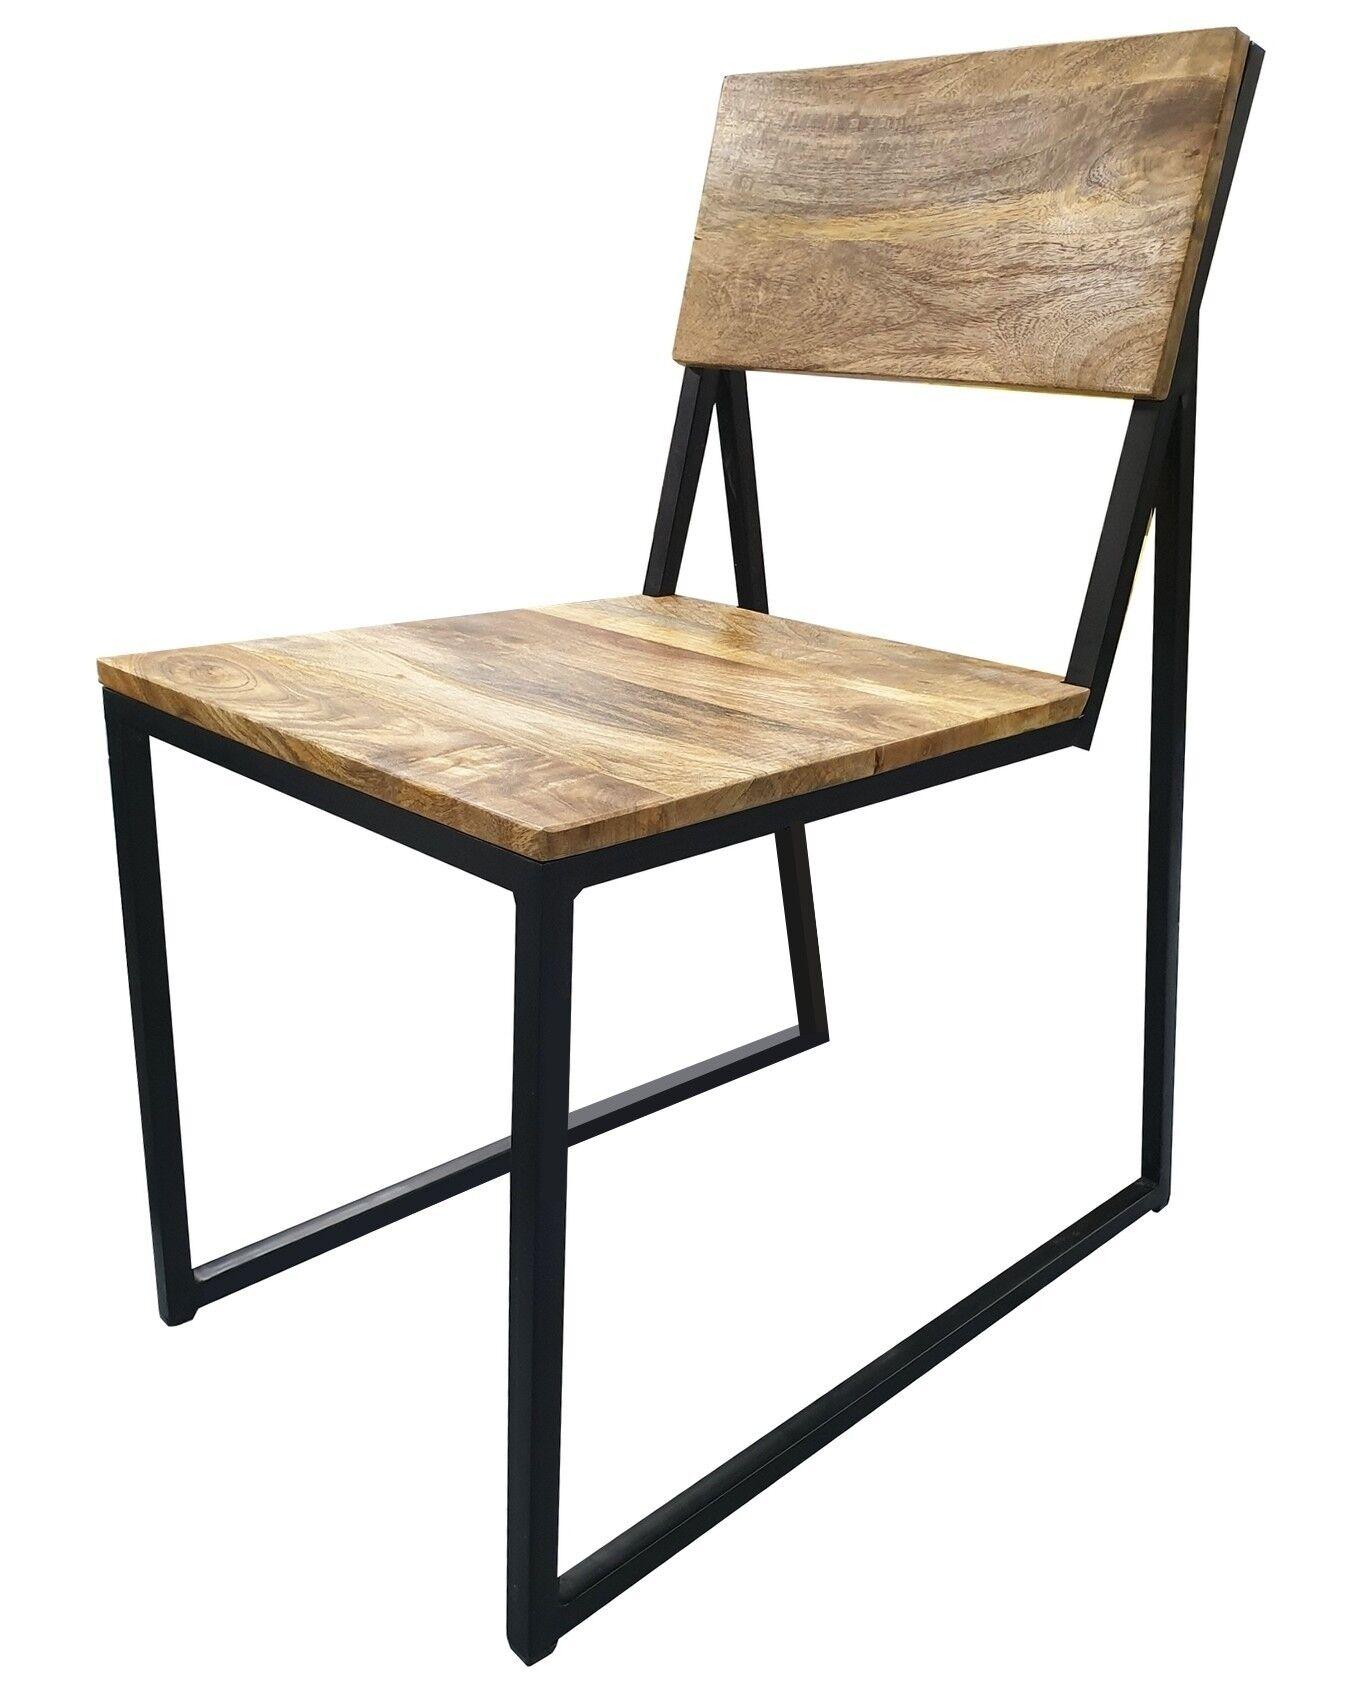 gdegdesign Chaise design industriel bois massif et métal - Gunther